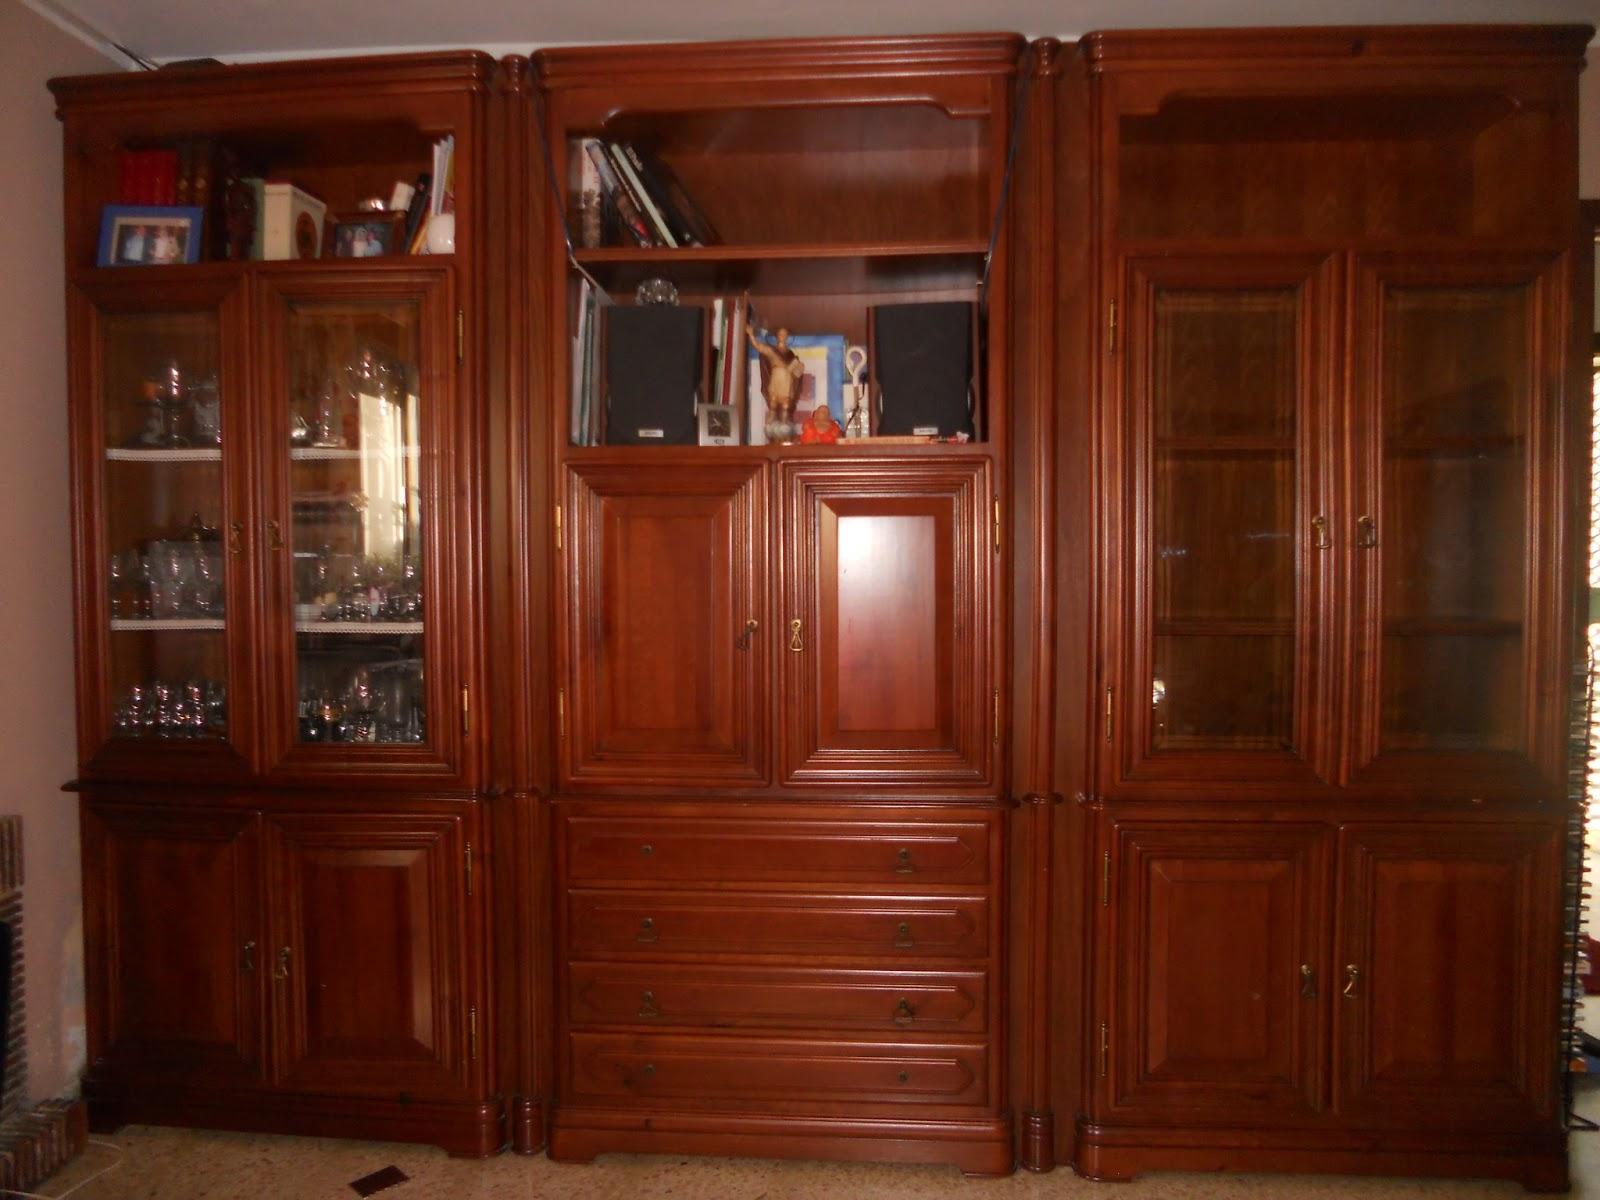 Artesare comedor restaurado - Muebles antiguos de comedor ...